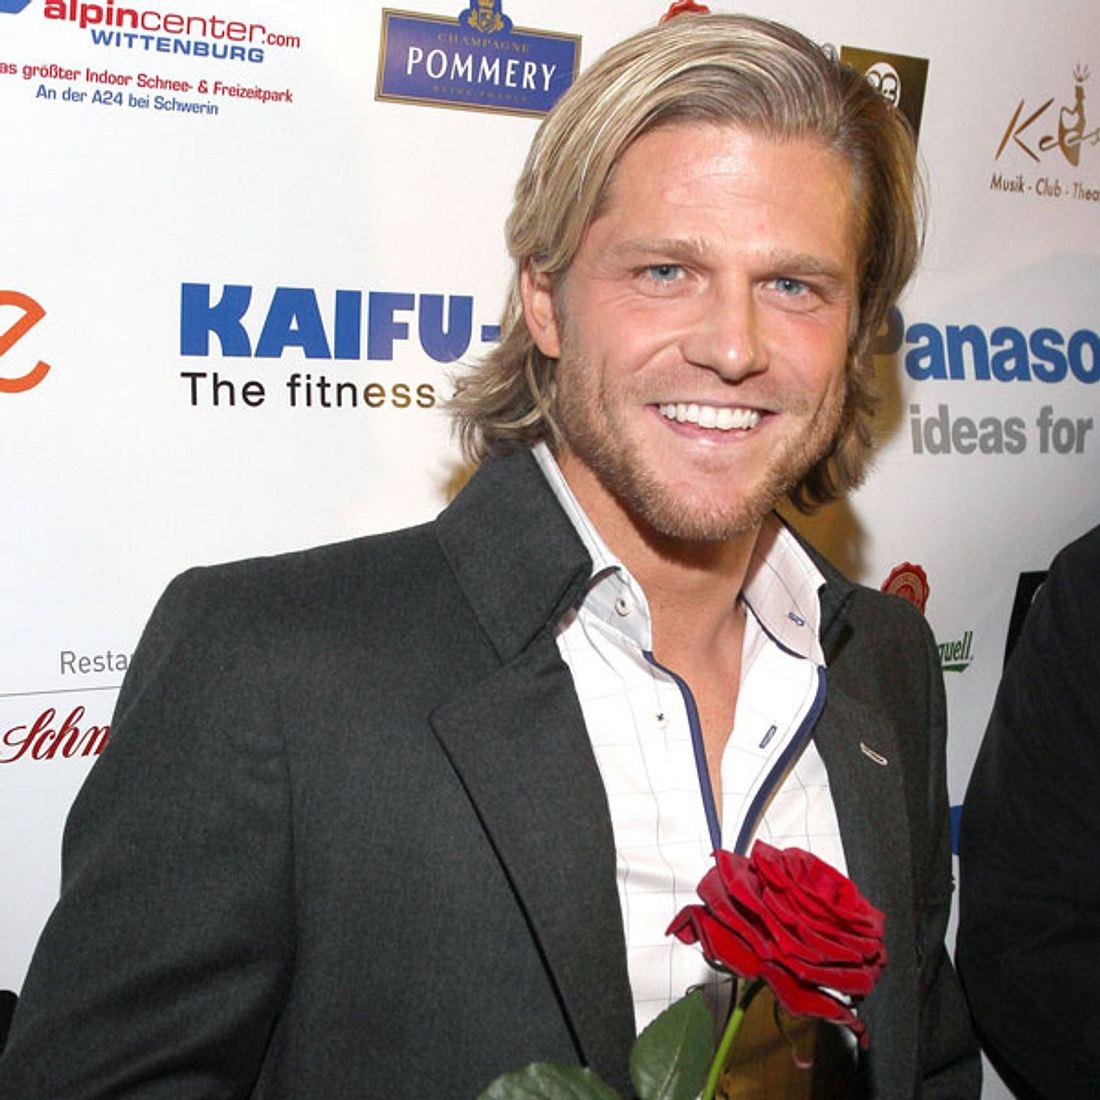 Bachelor Paul Janke 2012